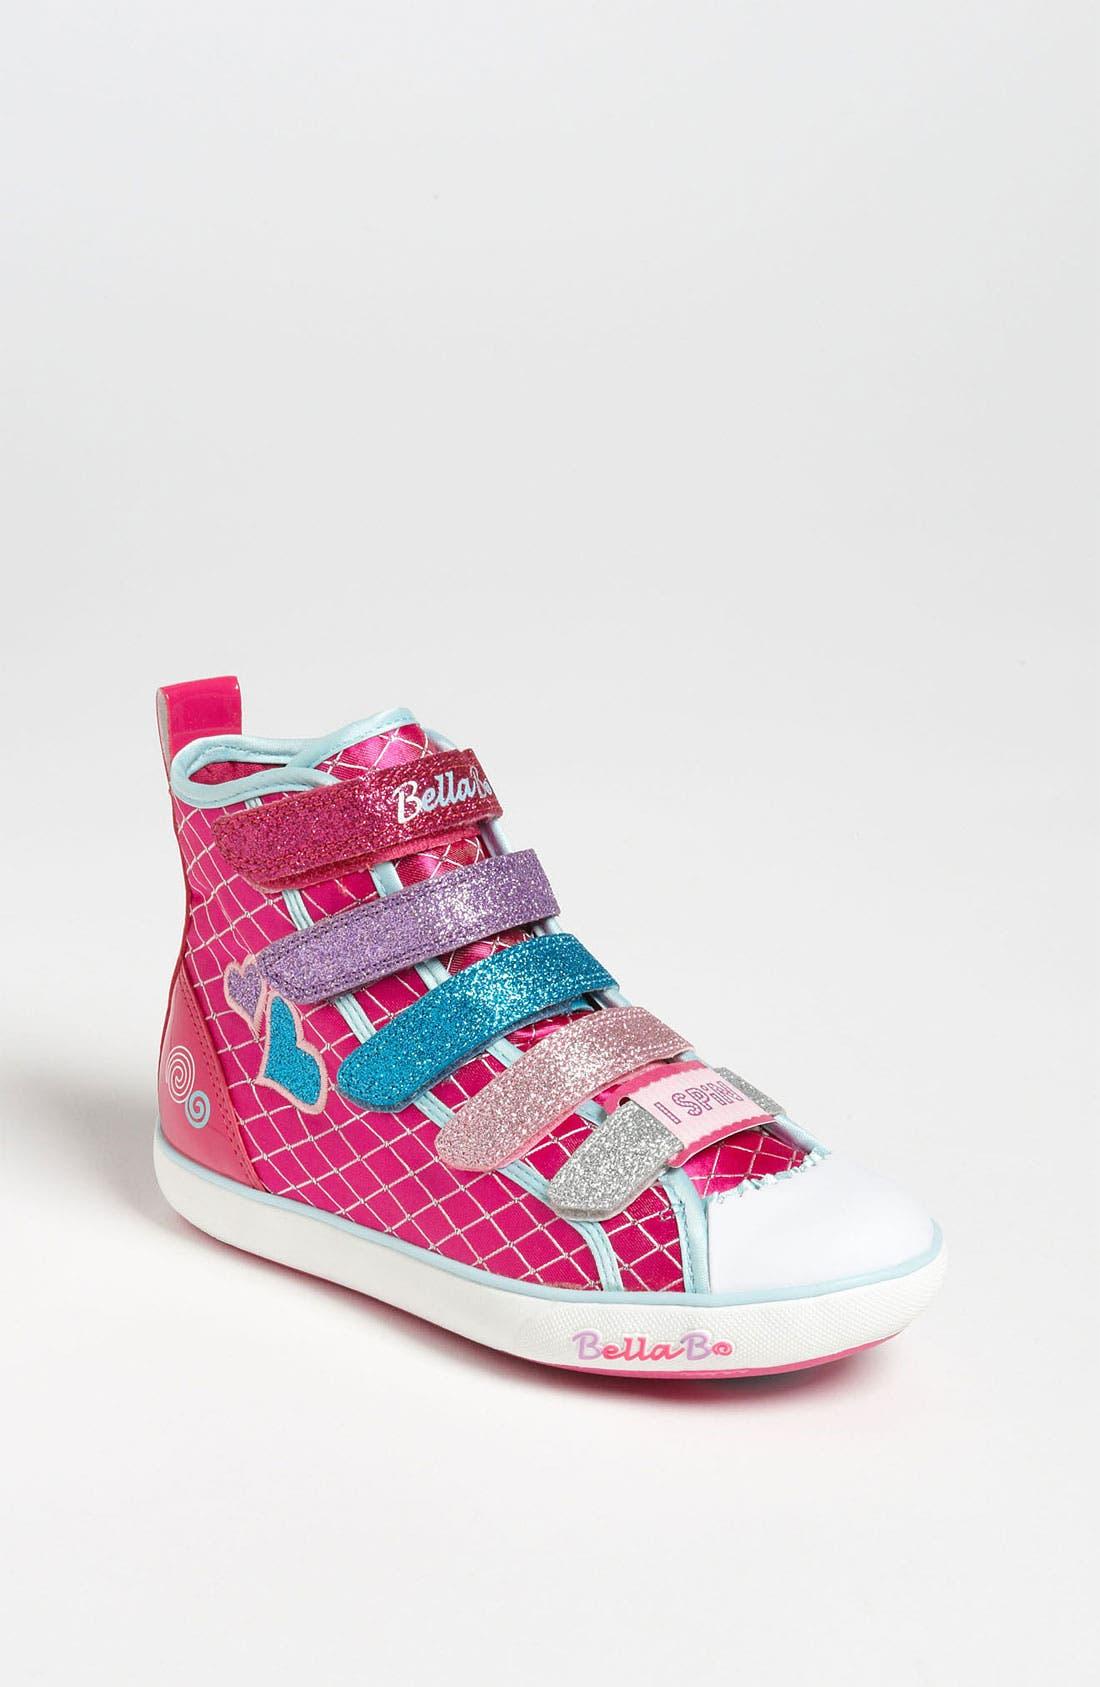 Alternate Image 1 Selected - SKECHERS 'Bella Ballerina - Curtsies' Sneaker (Toddler & Little Kid)